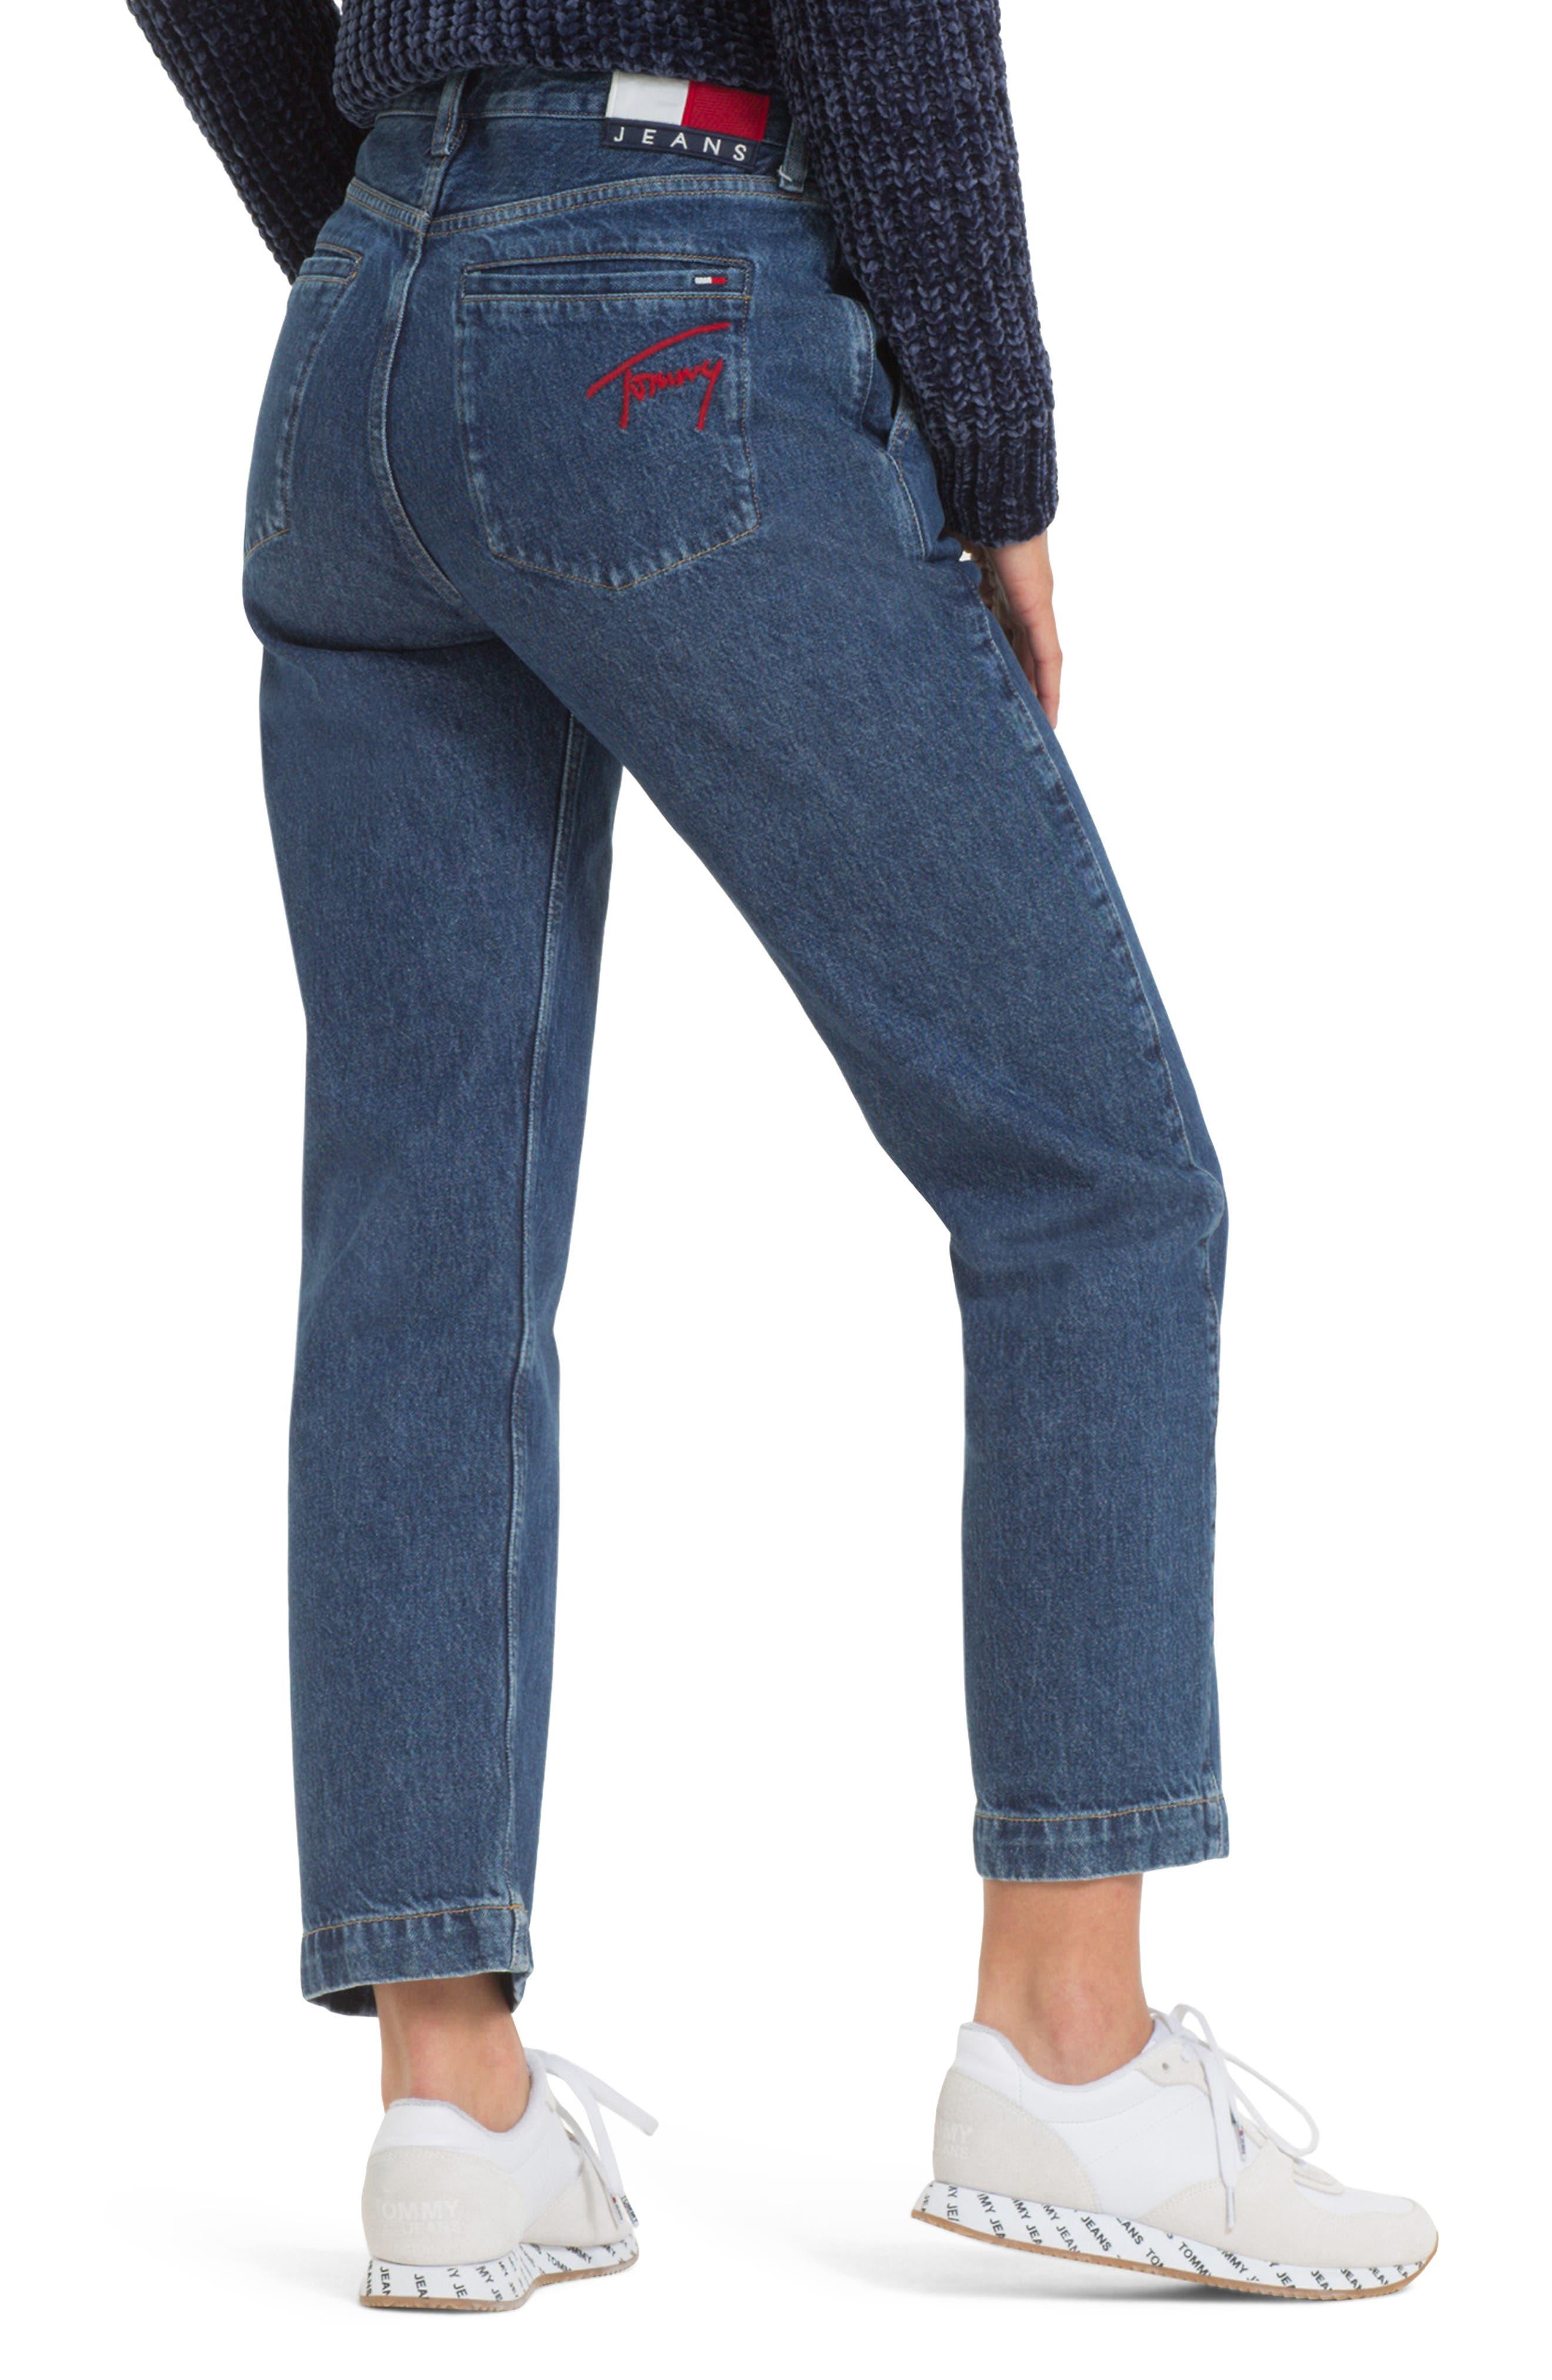 TJW Straight Leg Jeans,                             Alternate thumbnail 2, color,                             GOUGH MID BLUE RIGID